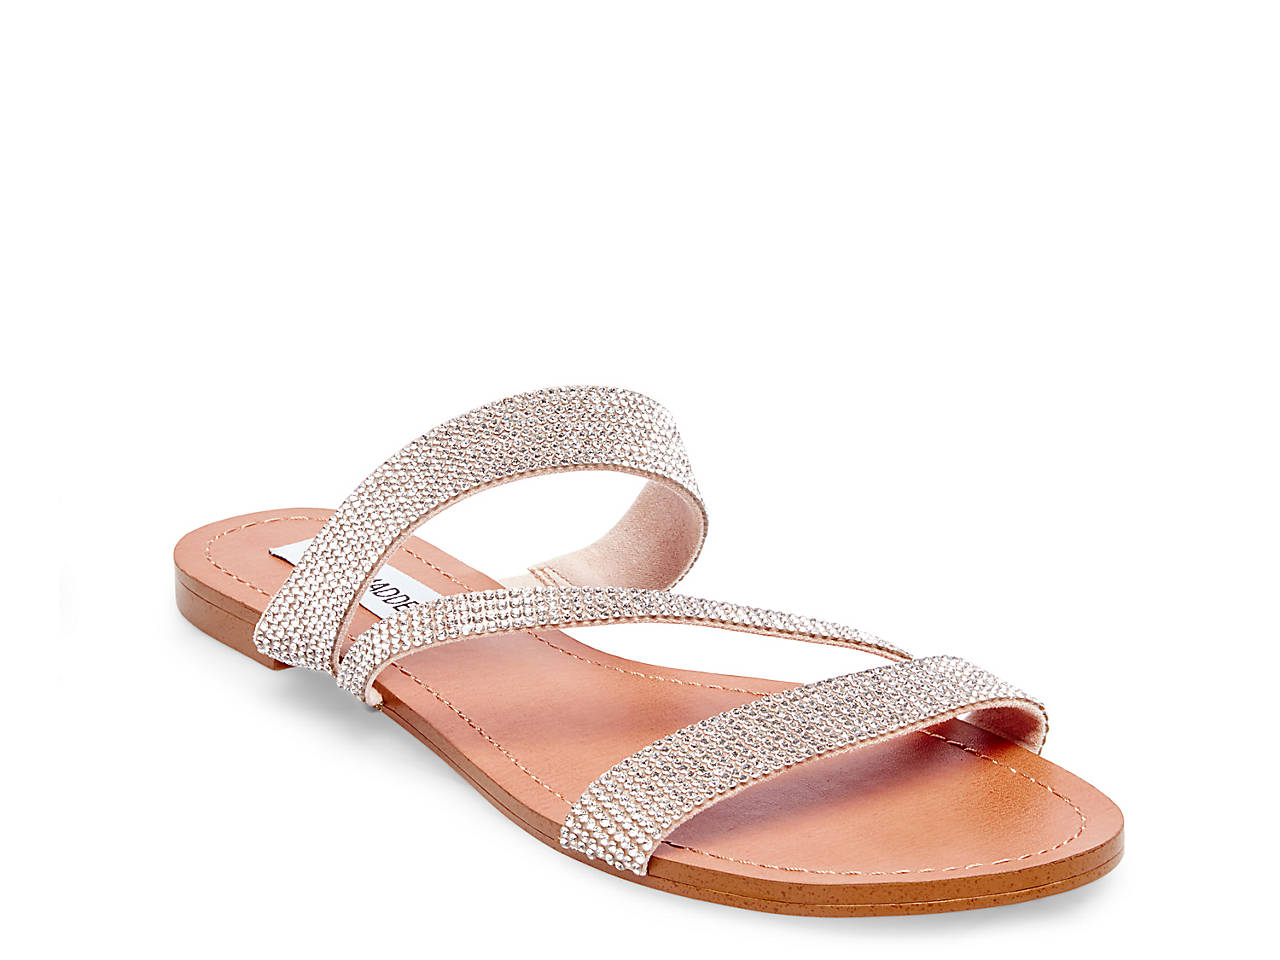 dbddc24683c Steve Madden Lorie Flat Sandal Women s Shoes